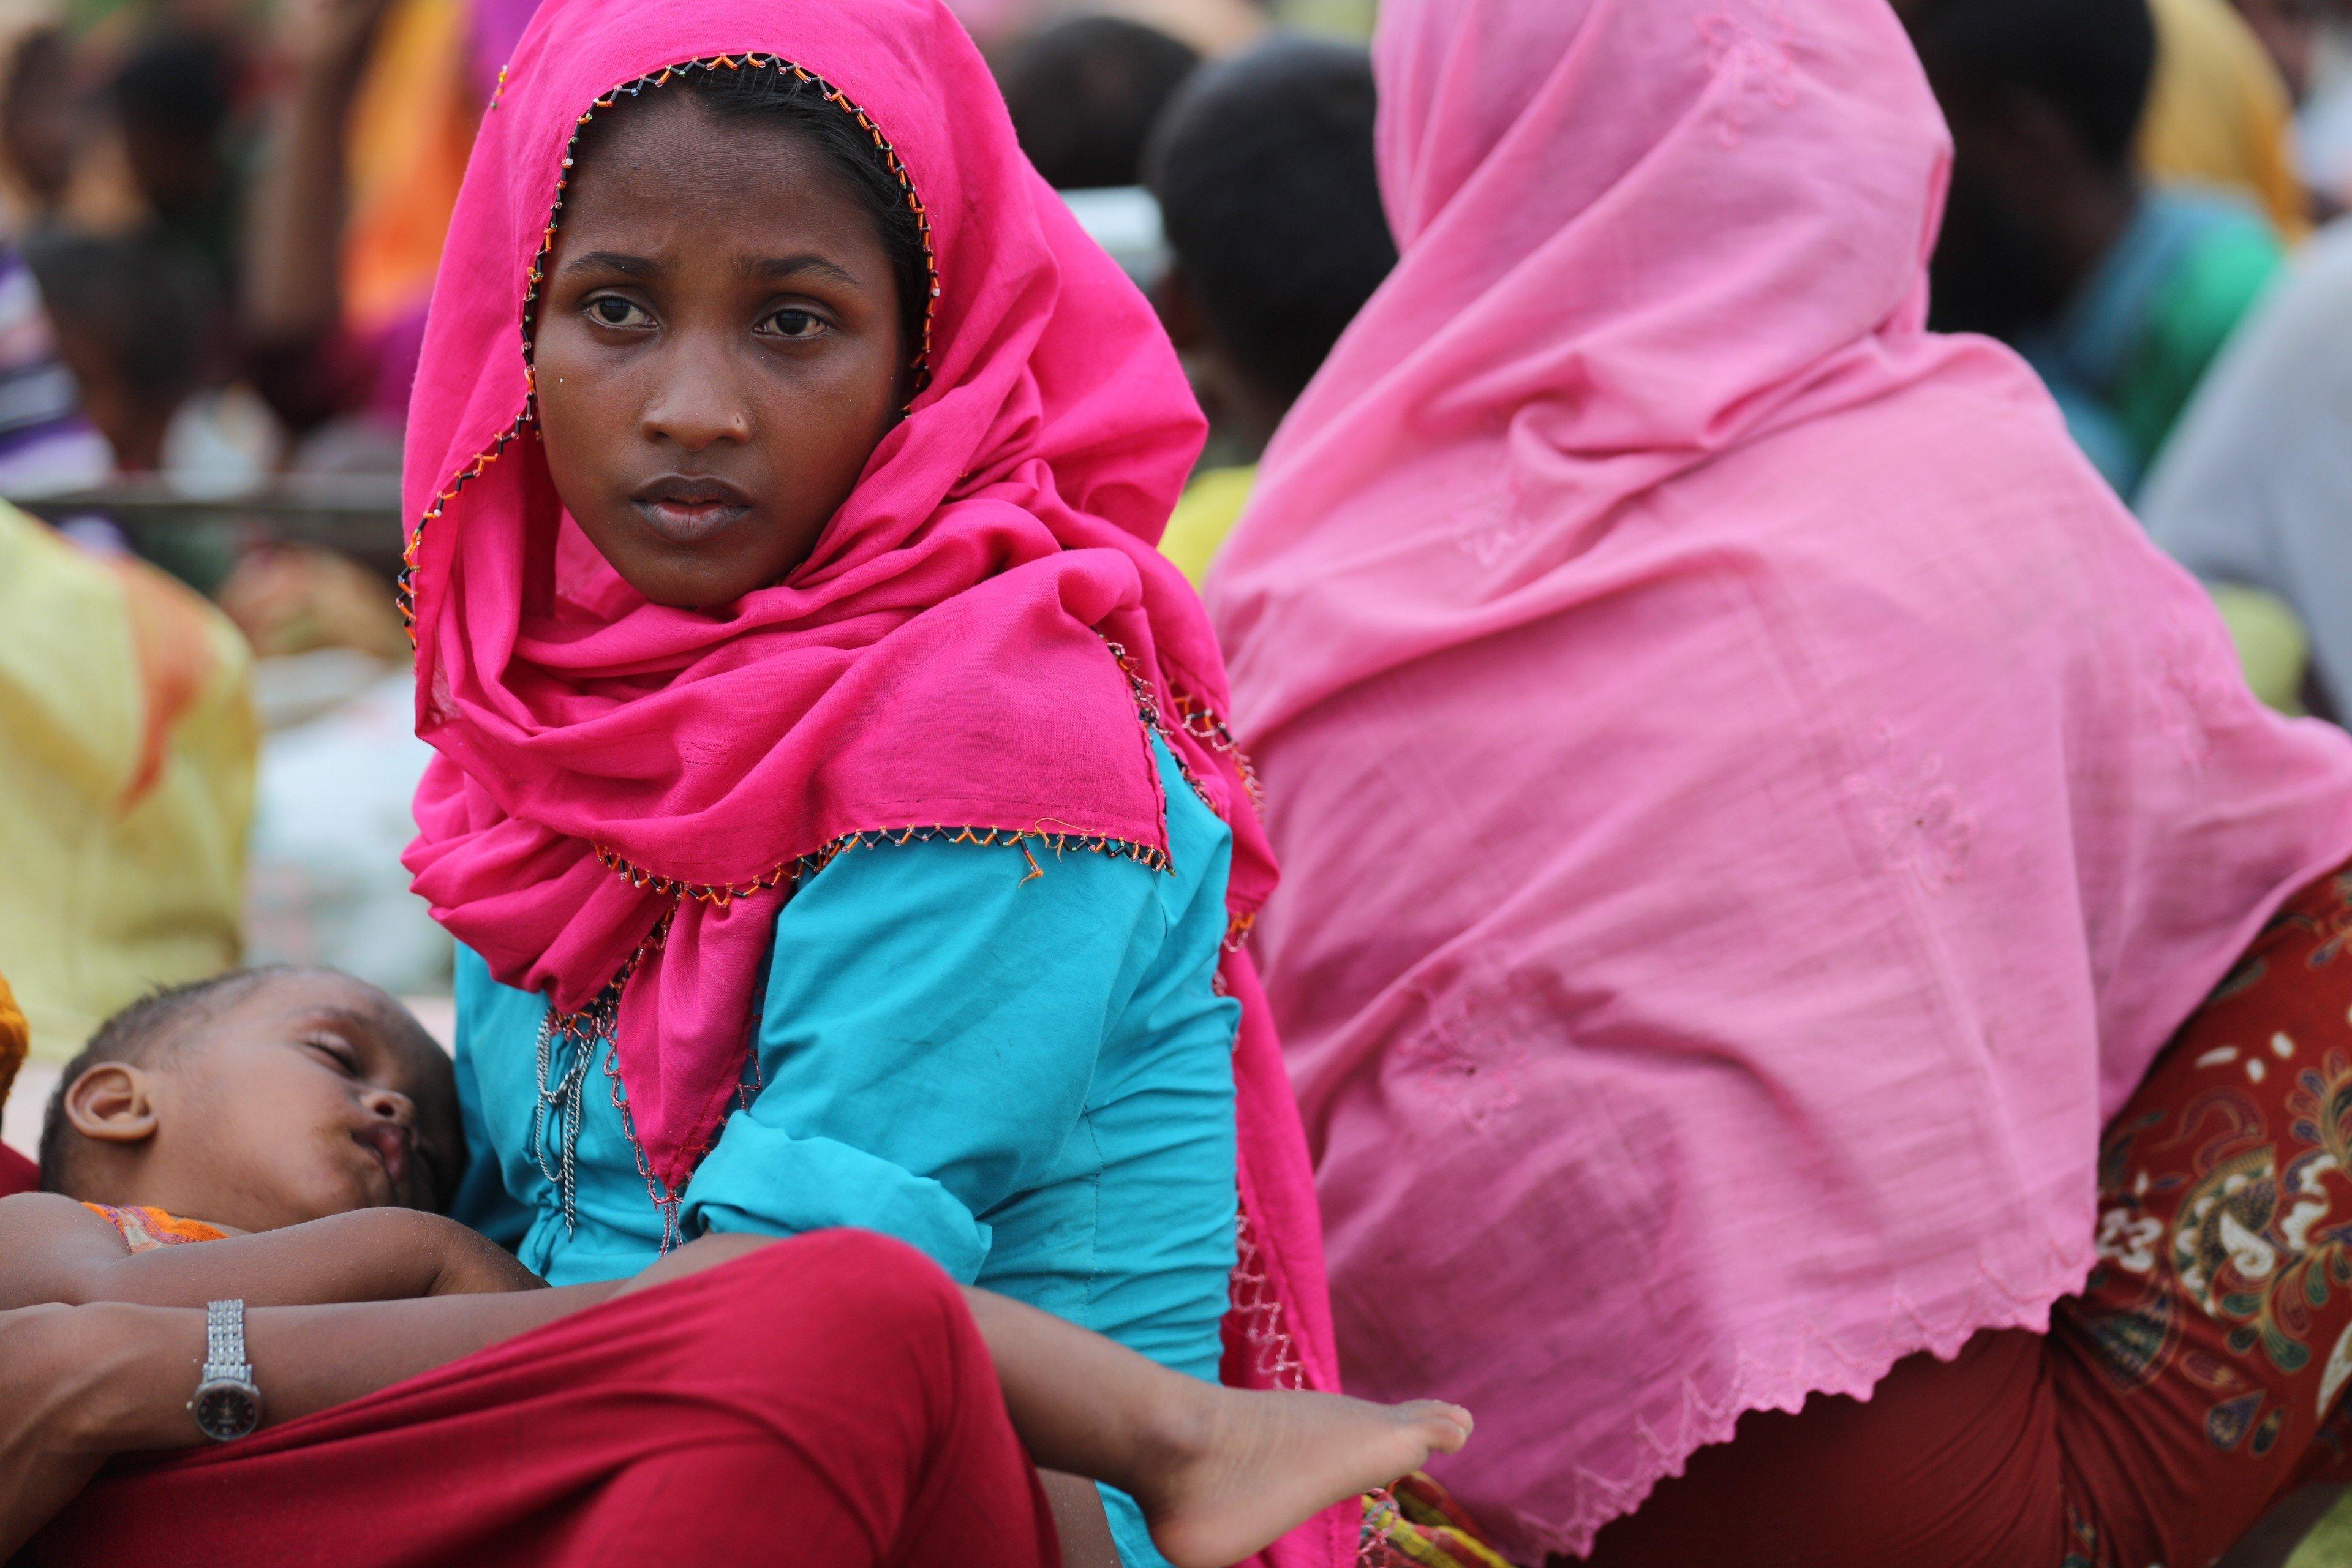 SHAH PORI ISLAND, TEKNAFF, BANGLADESH - SEPTEMBER 10 : Rohingya Muslims, fled from ongoing military operations in Myanmars Rakhine state, fled Bangladesh by boat over sea in Shah pori island, Teknaff, Bangladesh on September 10, 2017.    (Photo by Zakir Hossain Chowdhury/Anadolu Agency/Getty Images)